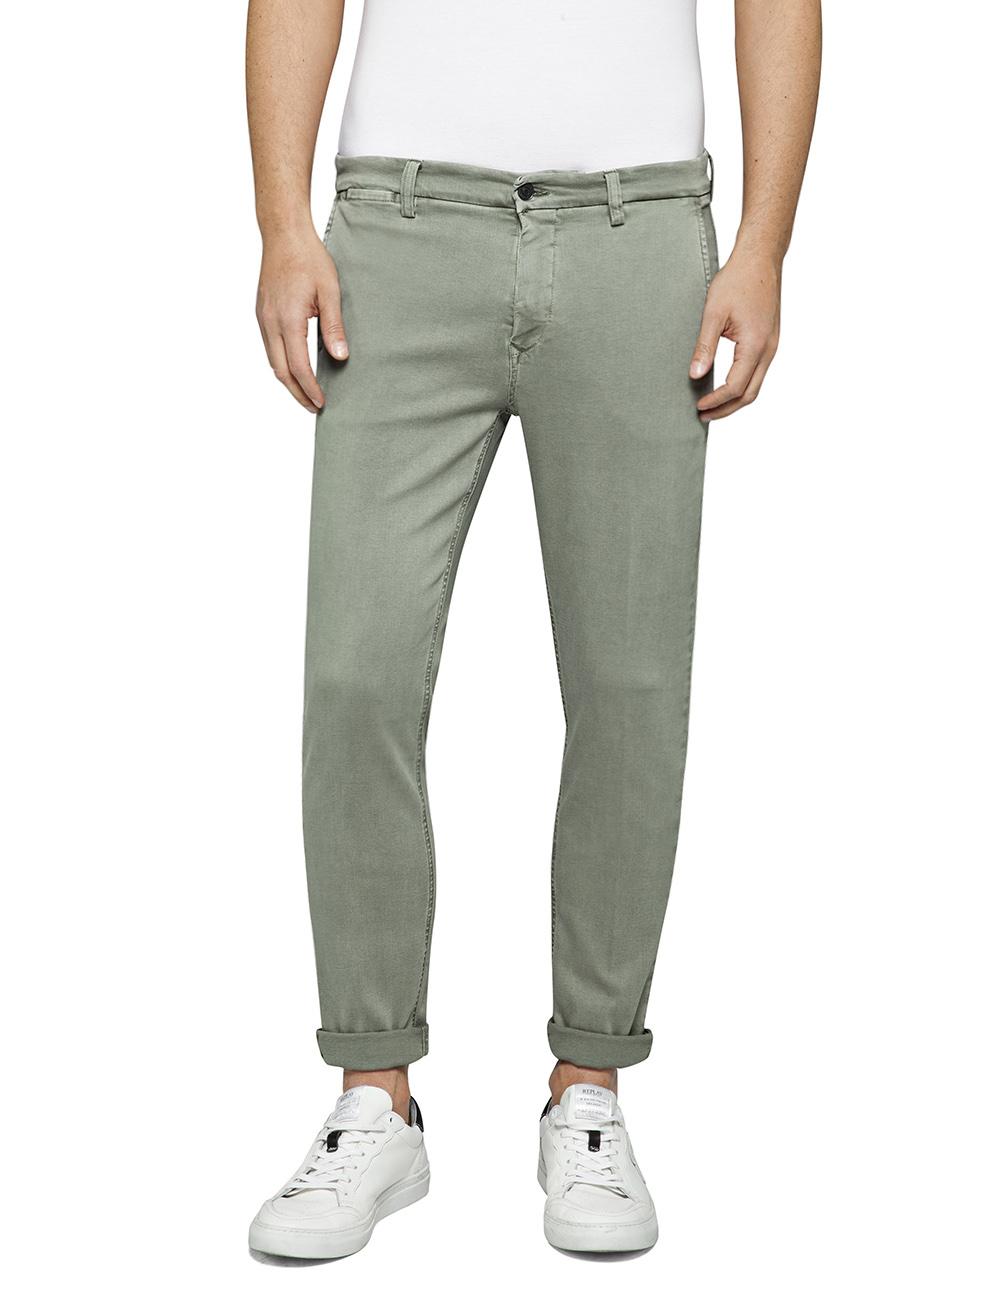 REPLAY | 11.5 OZ HYPERFLEX STRETCH DENIM Pants